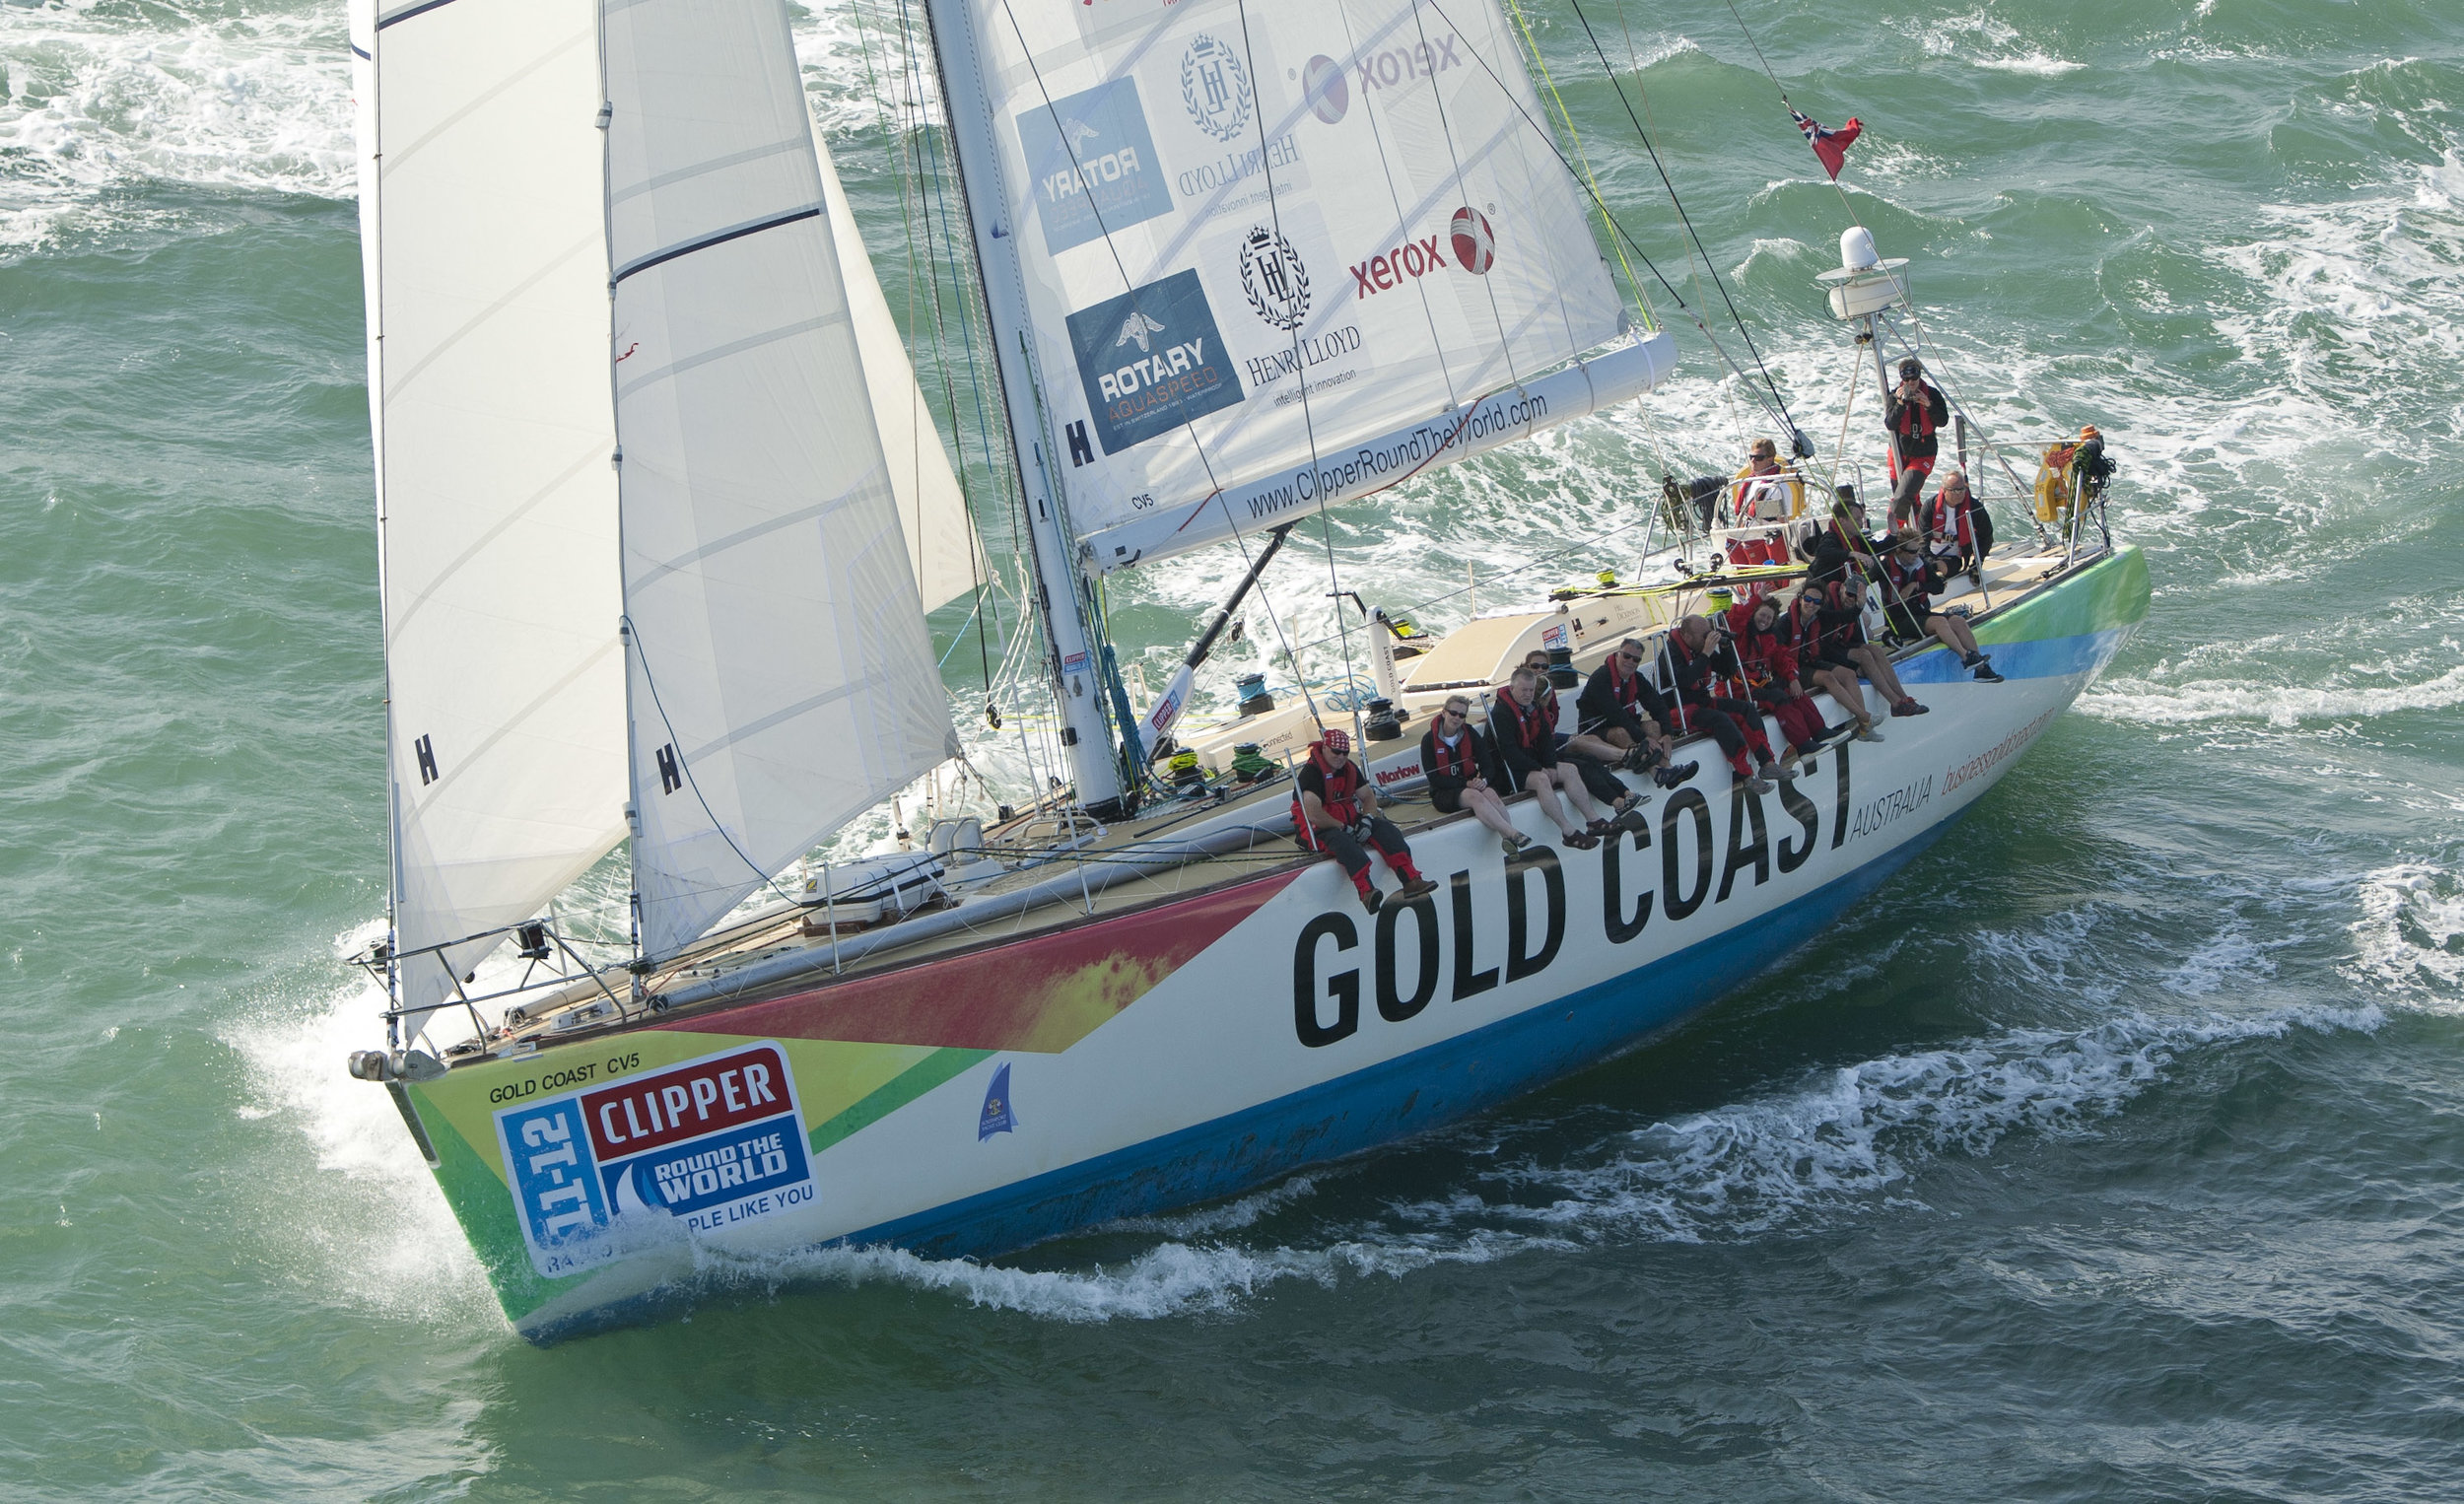 Clipper Race Winner Gold Coast